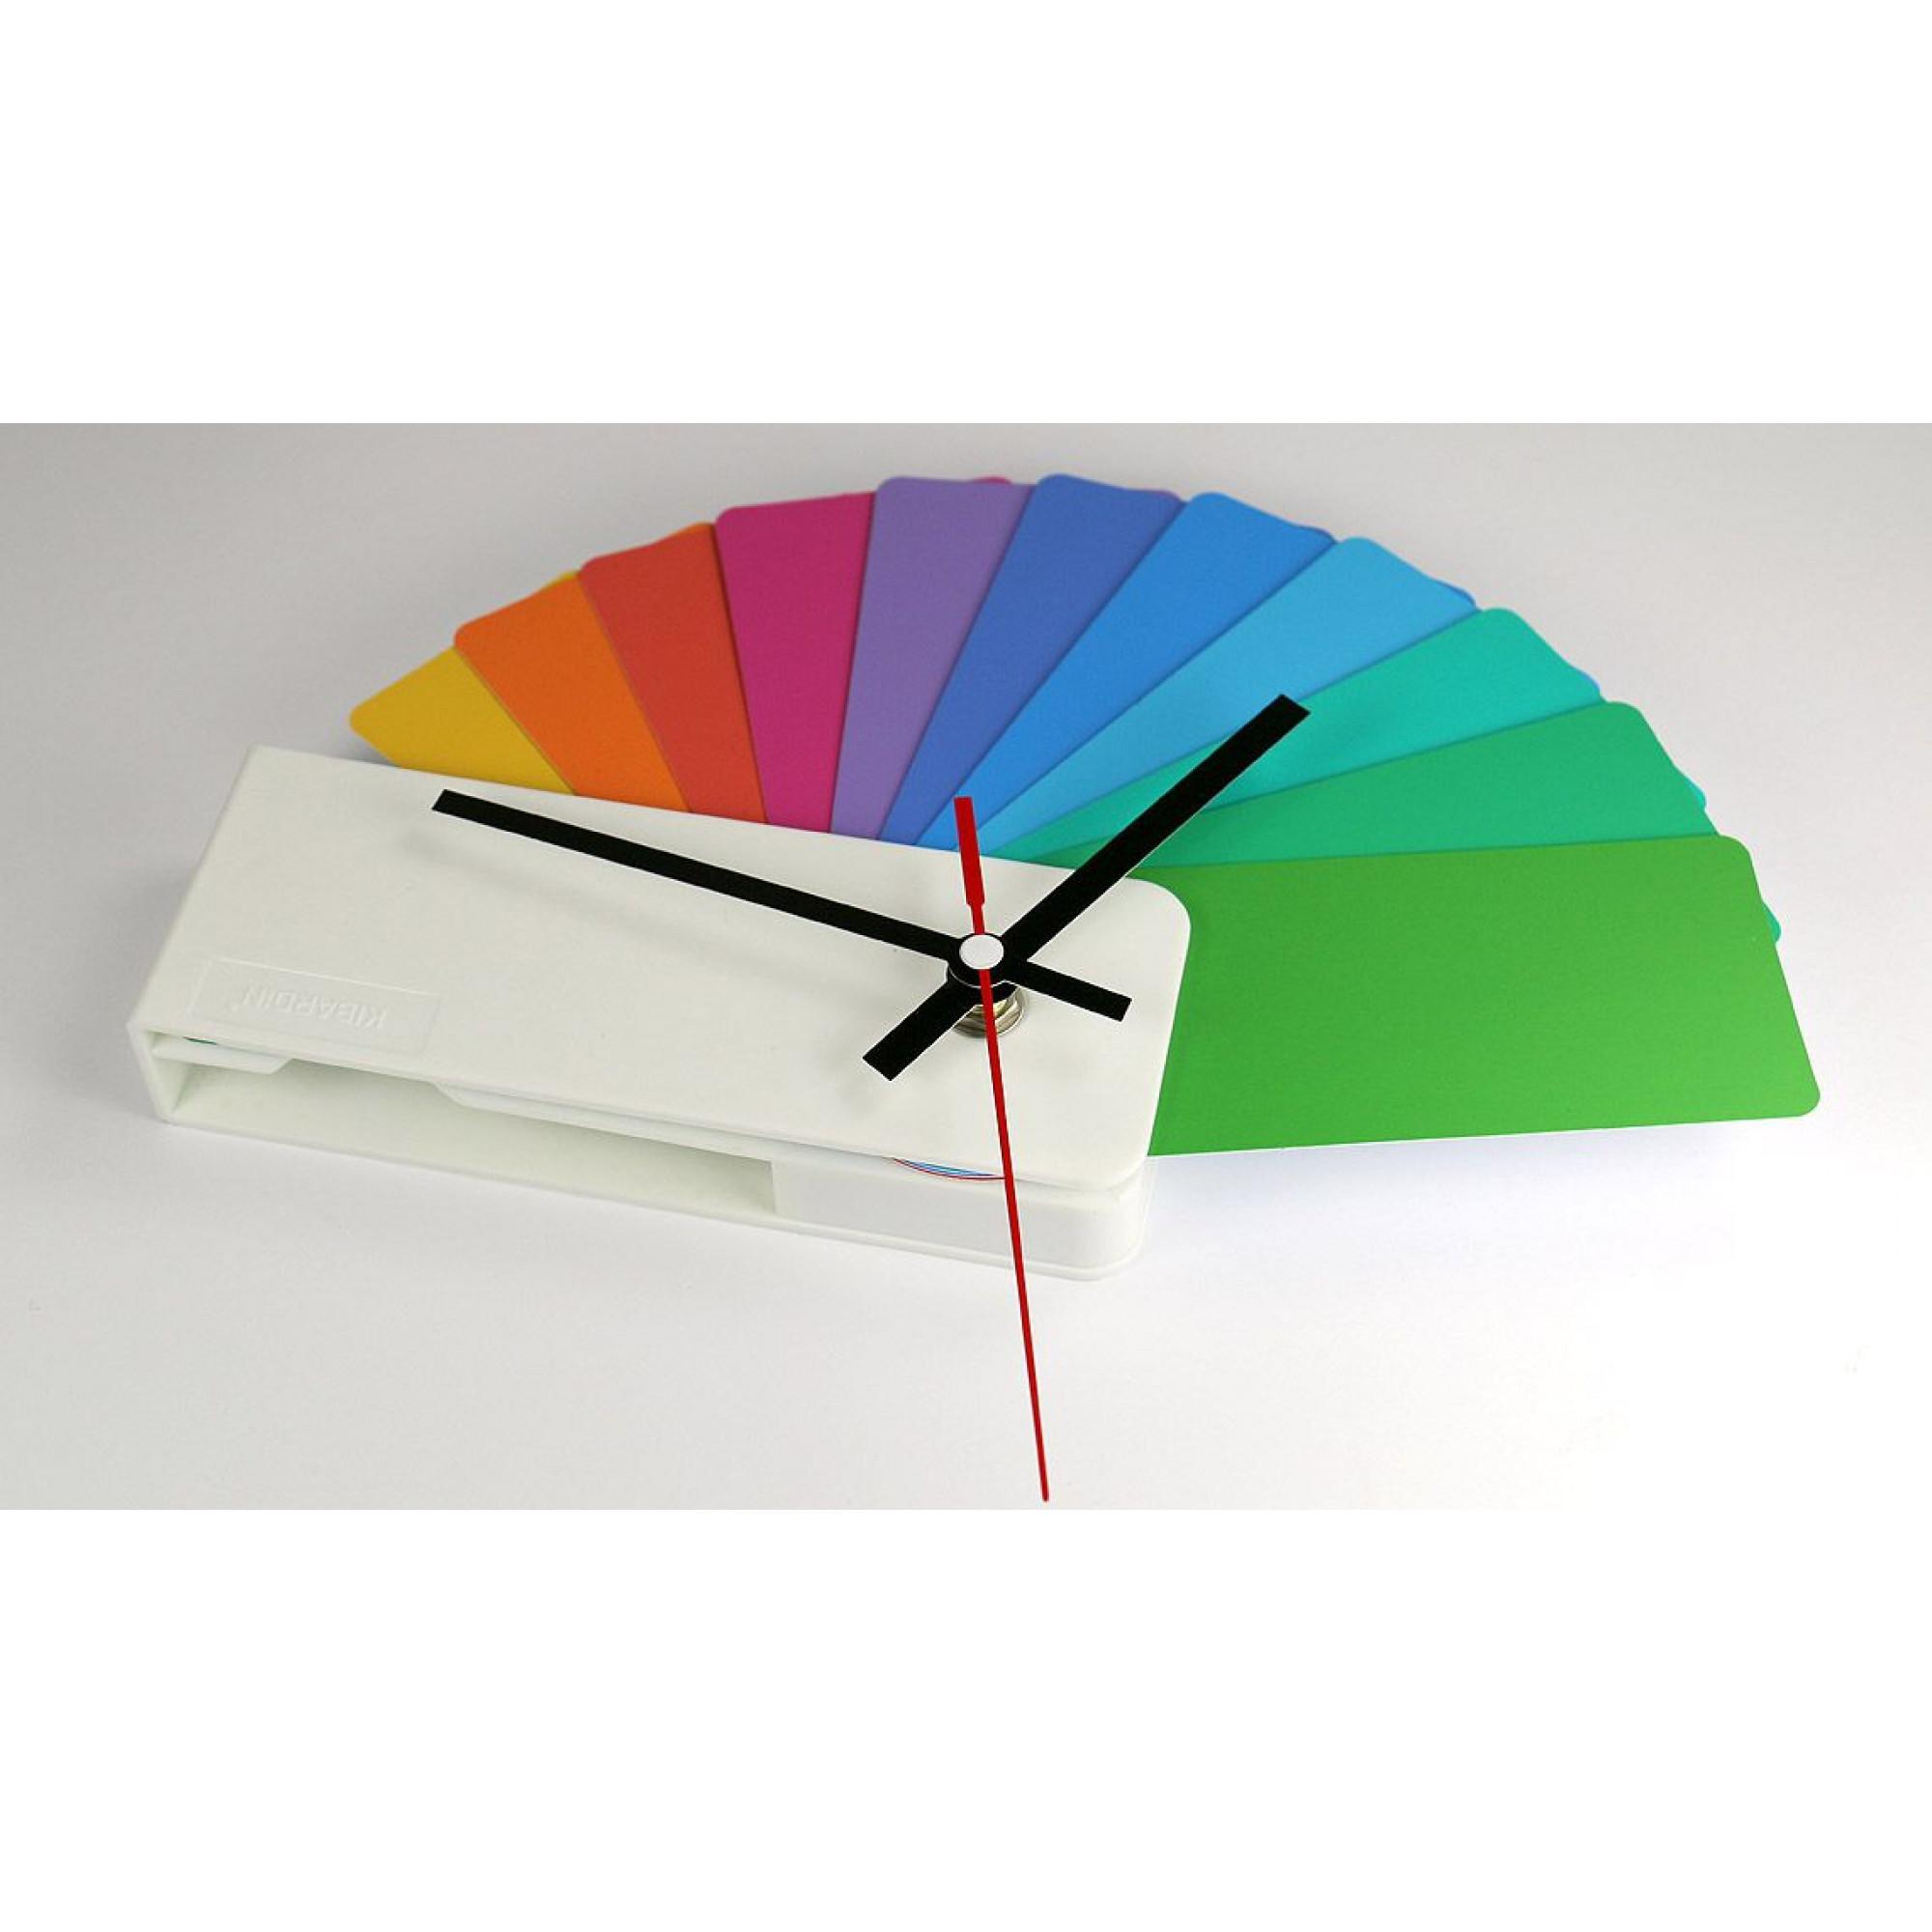 Desk/Wall Foldable Analog Clock Transformer | White & Multicolor